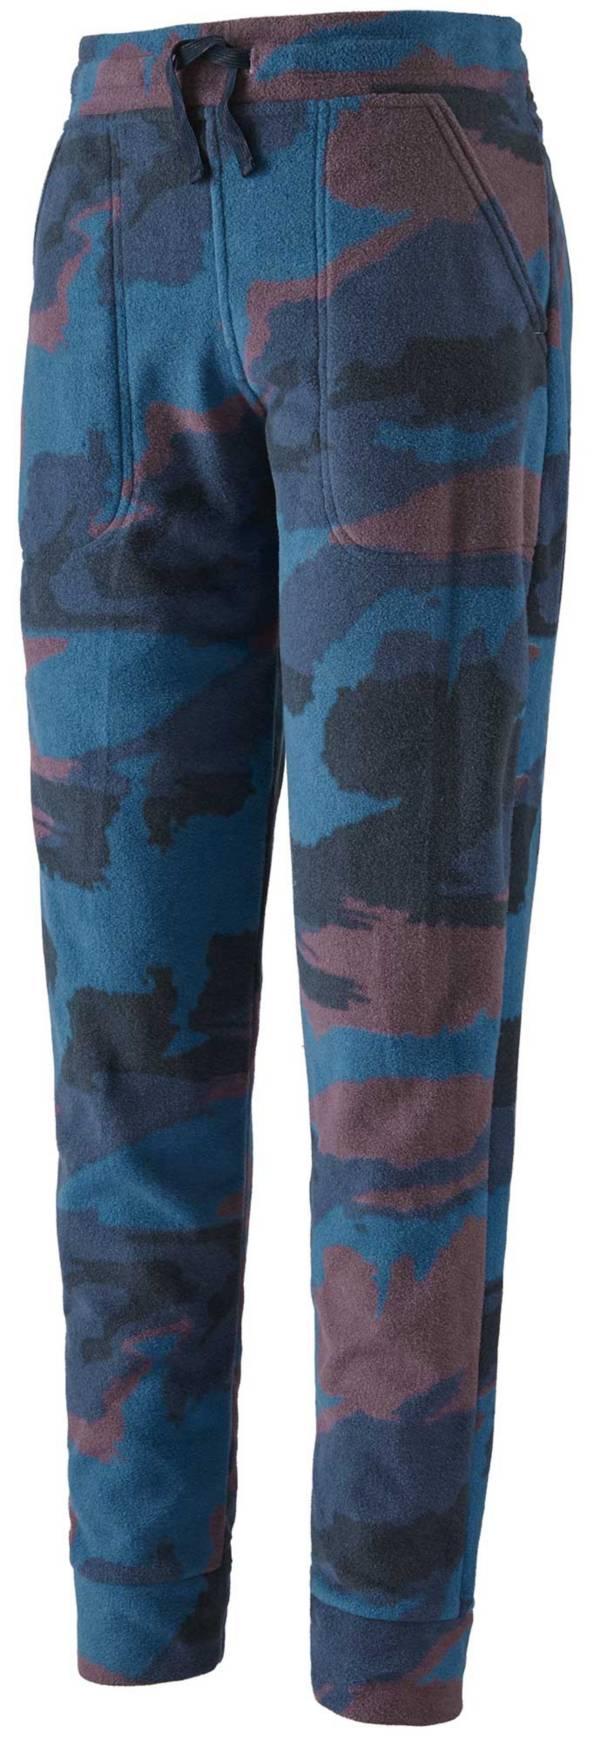 Patagonia Women's Snap-T Fleece Pants product image